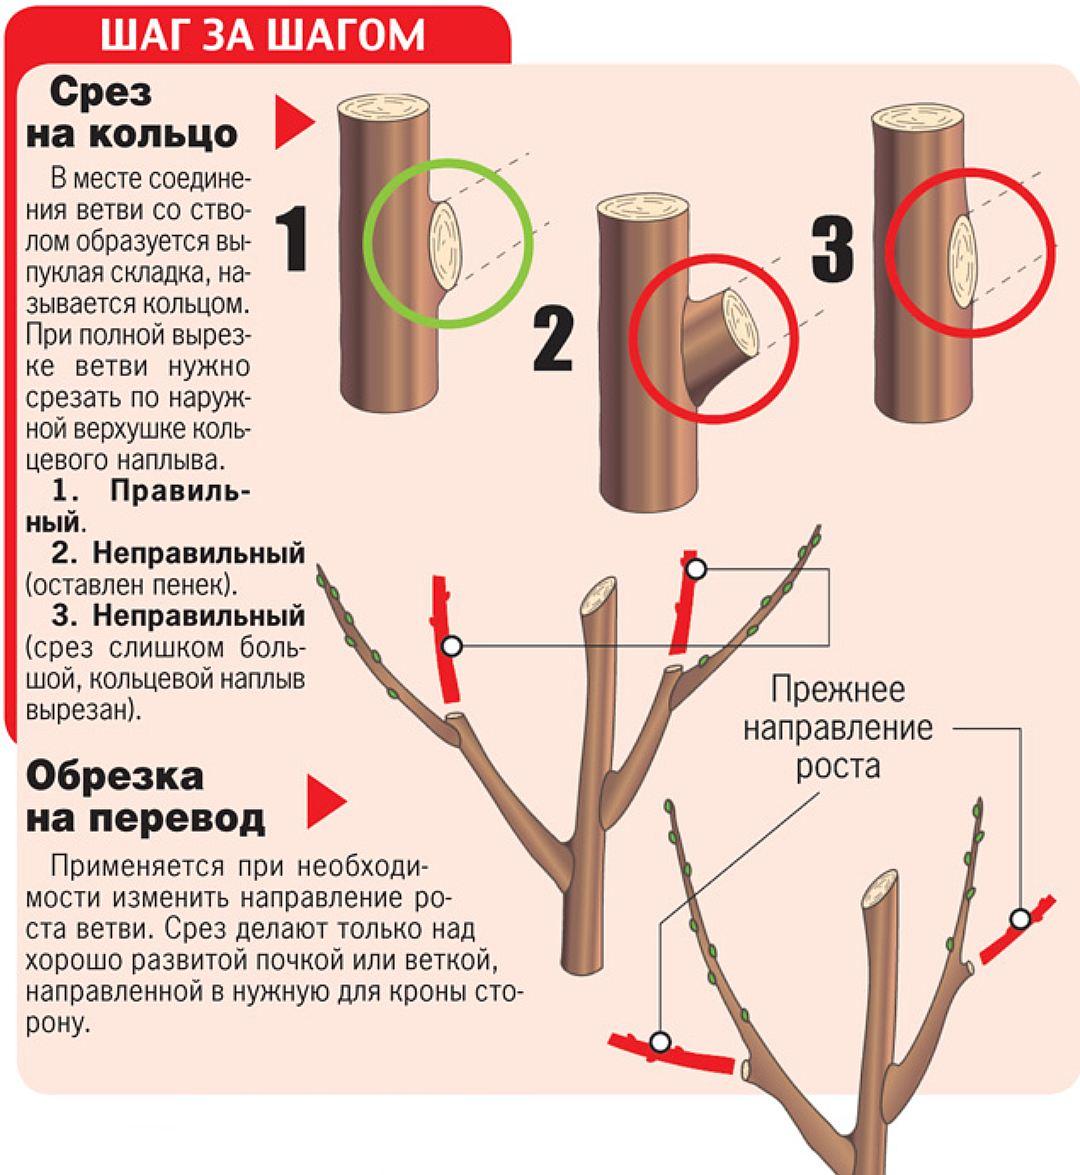 kakie-derevya-obrezat-v-fevrale-foto-sovety-po-obrezke-derevev-2